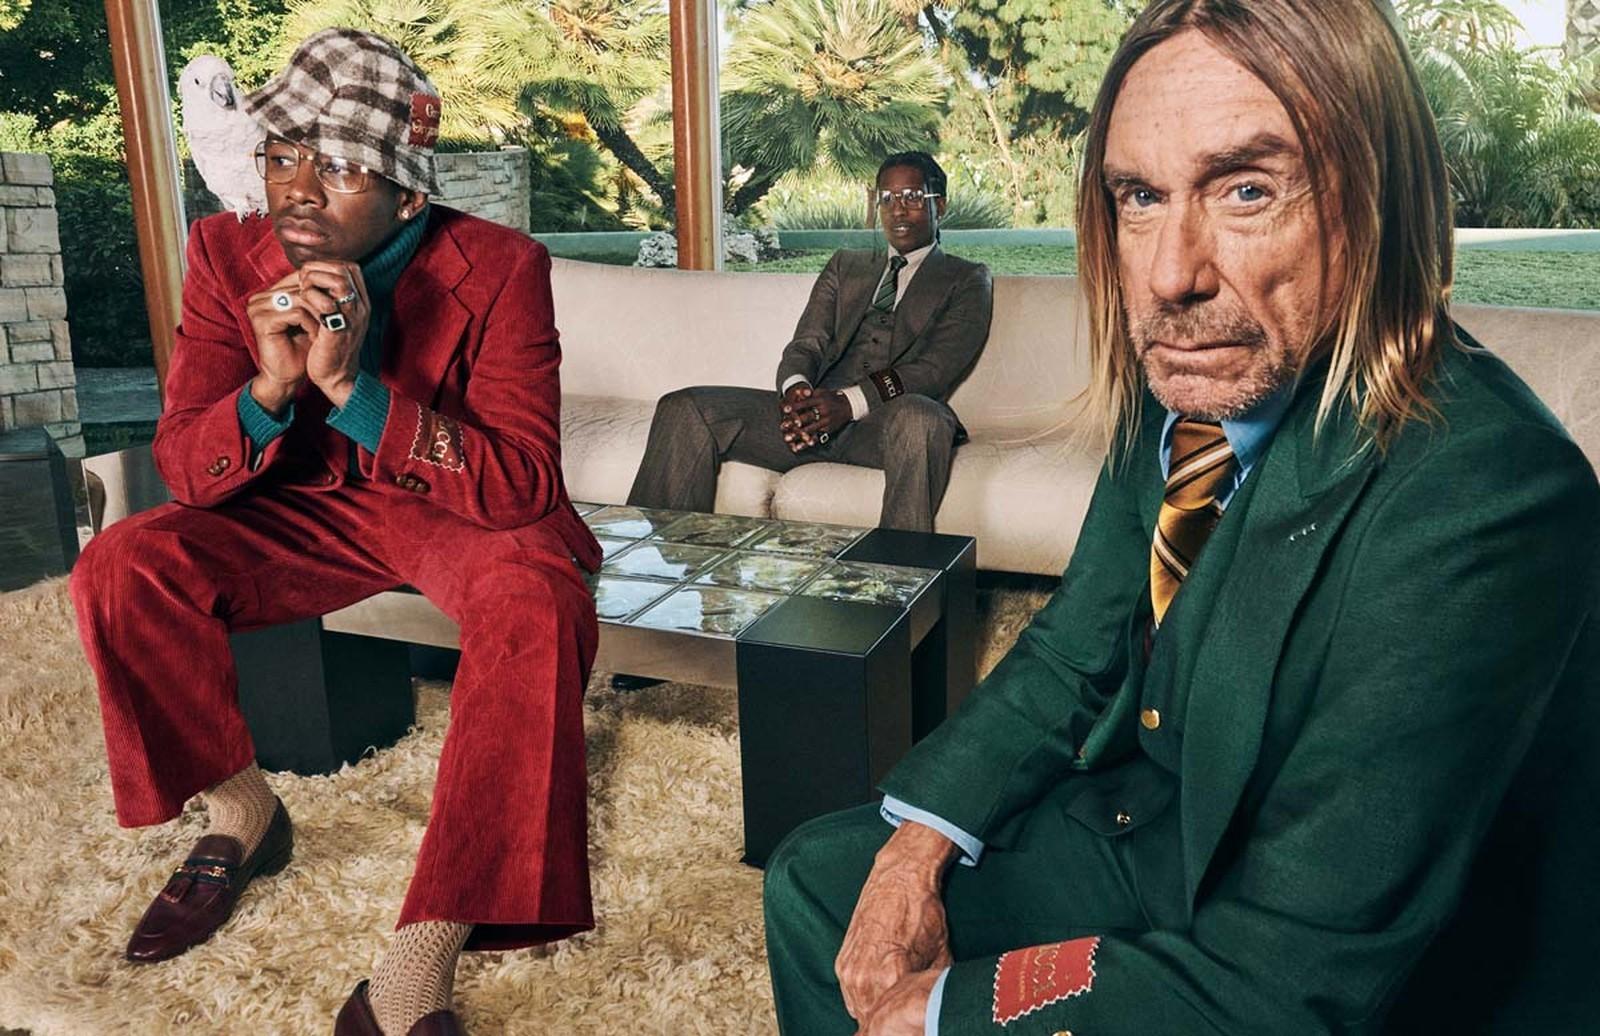 Gucci A$AP Rocky e Tyler, The Creator e Iggy Pop